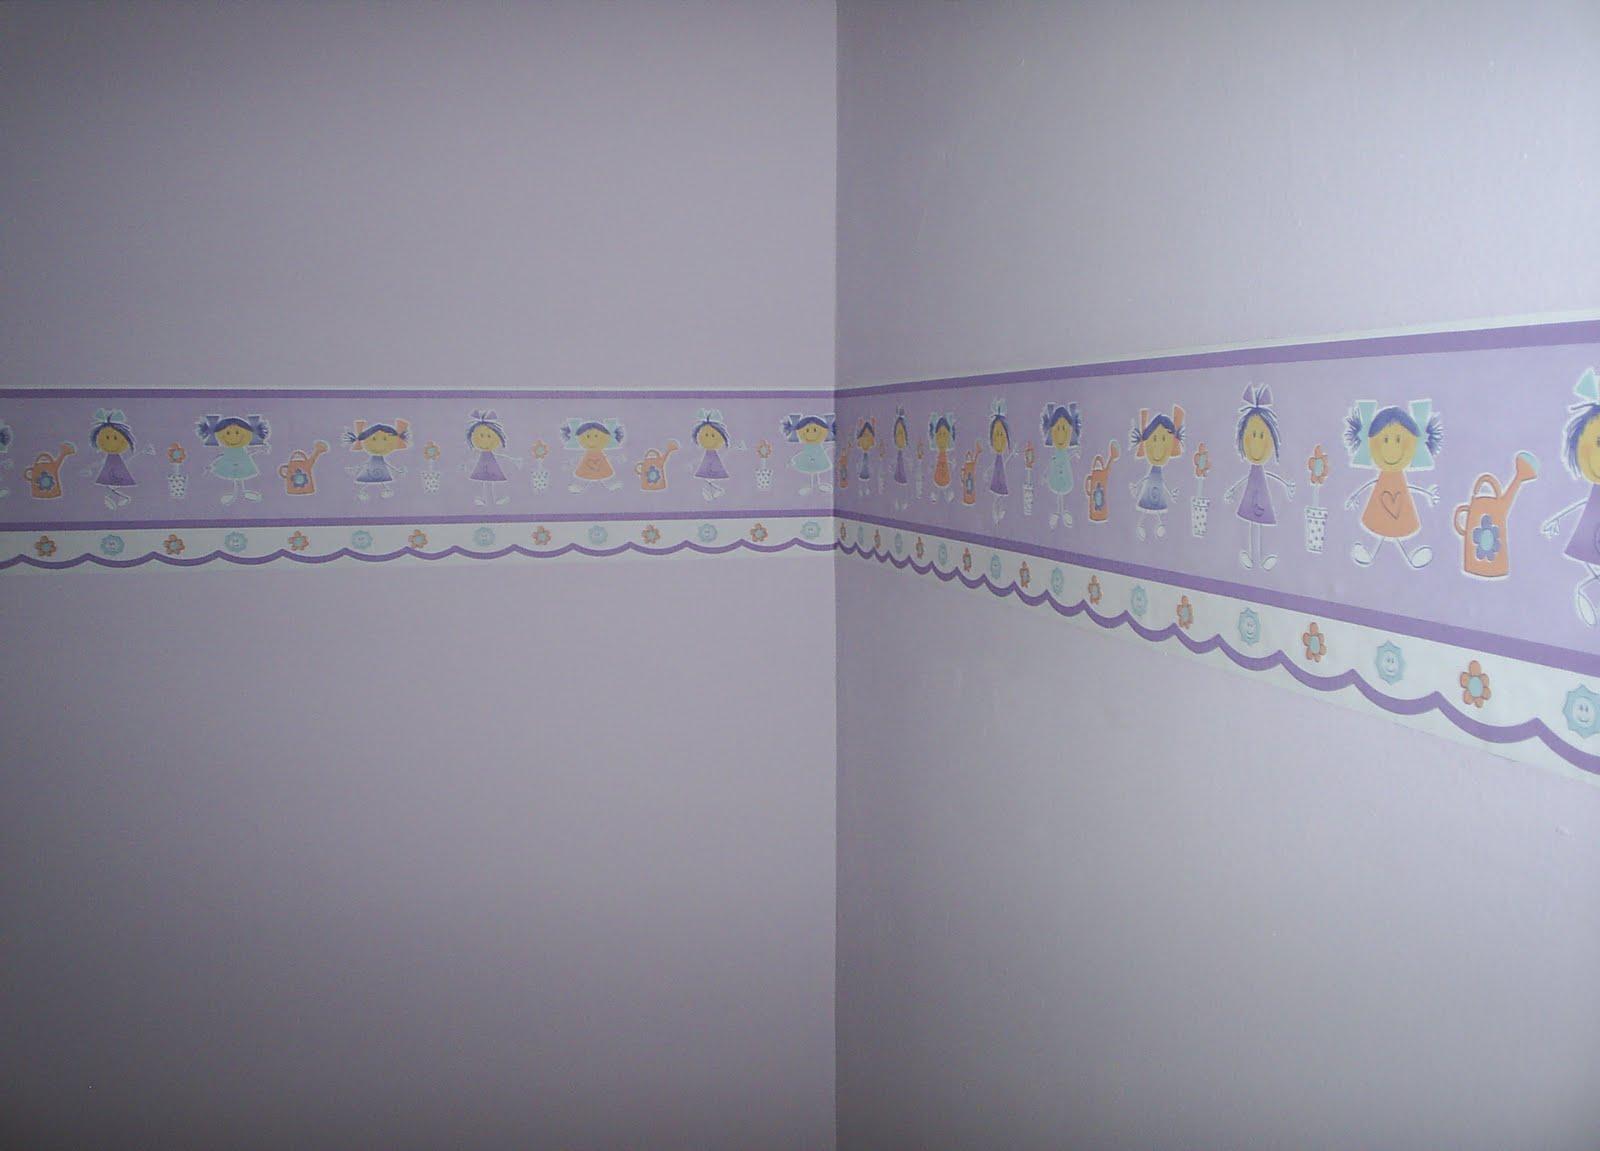 20170327005941 altura papel de parede quarto bebe - Papel pared bebe ...